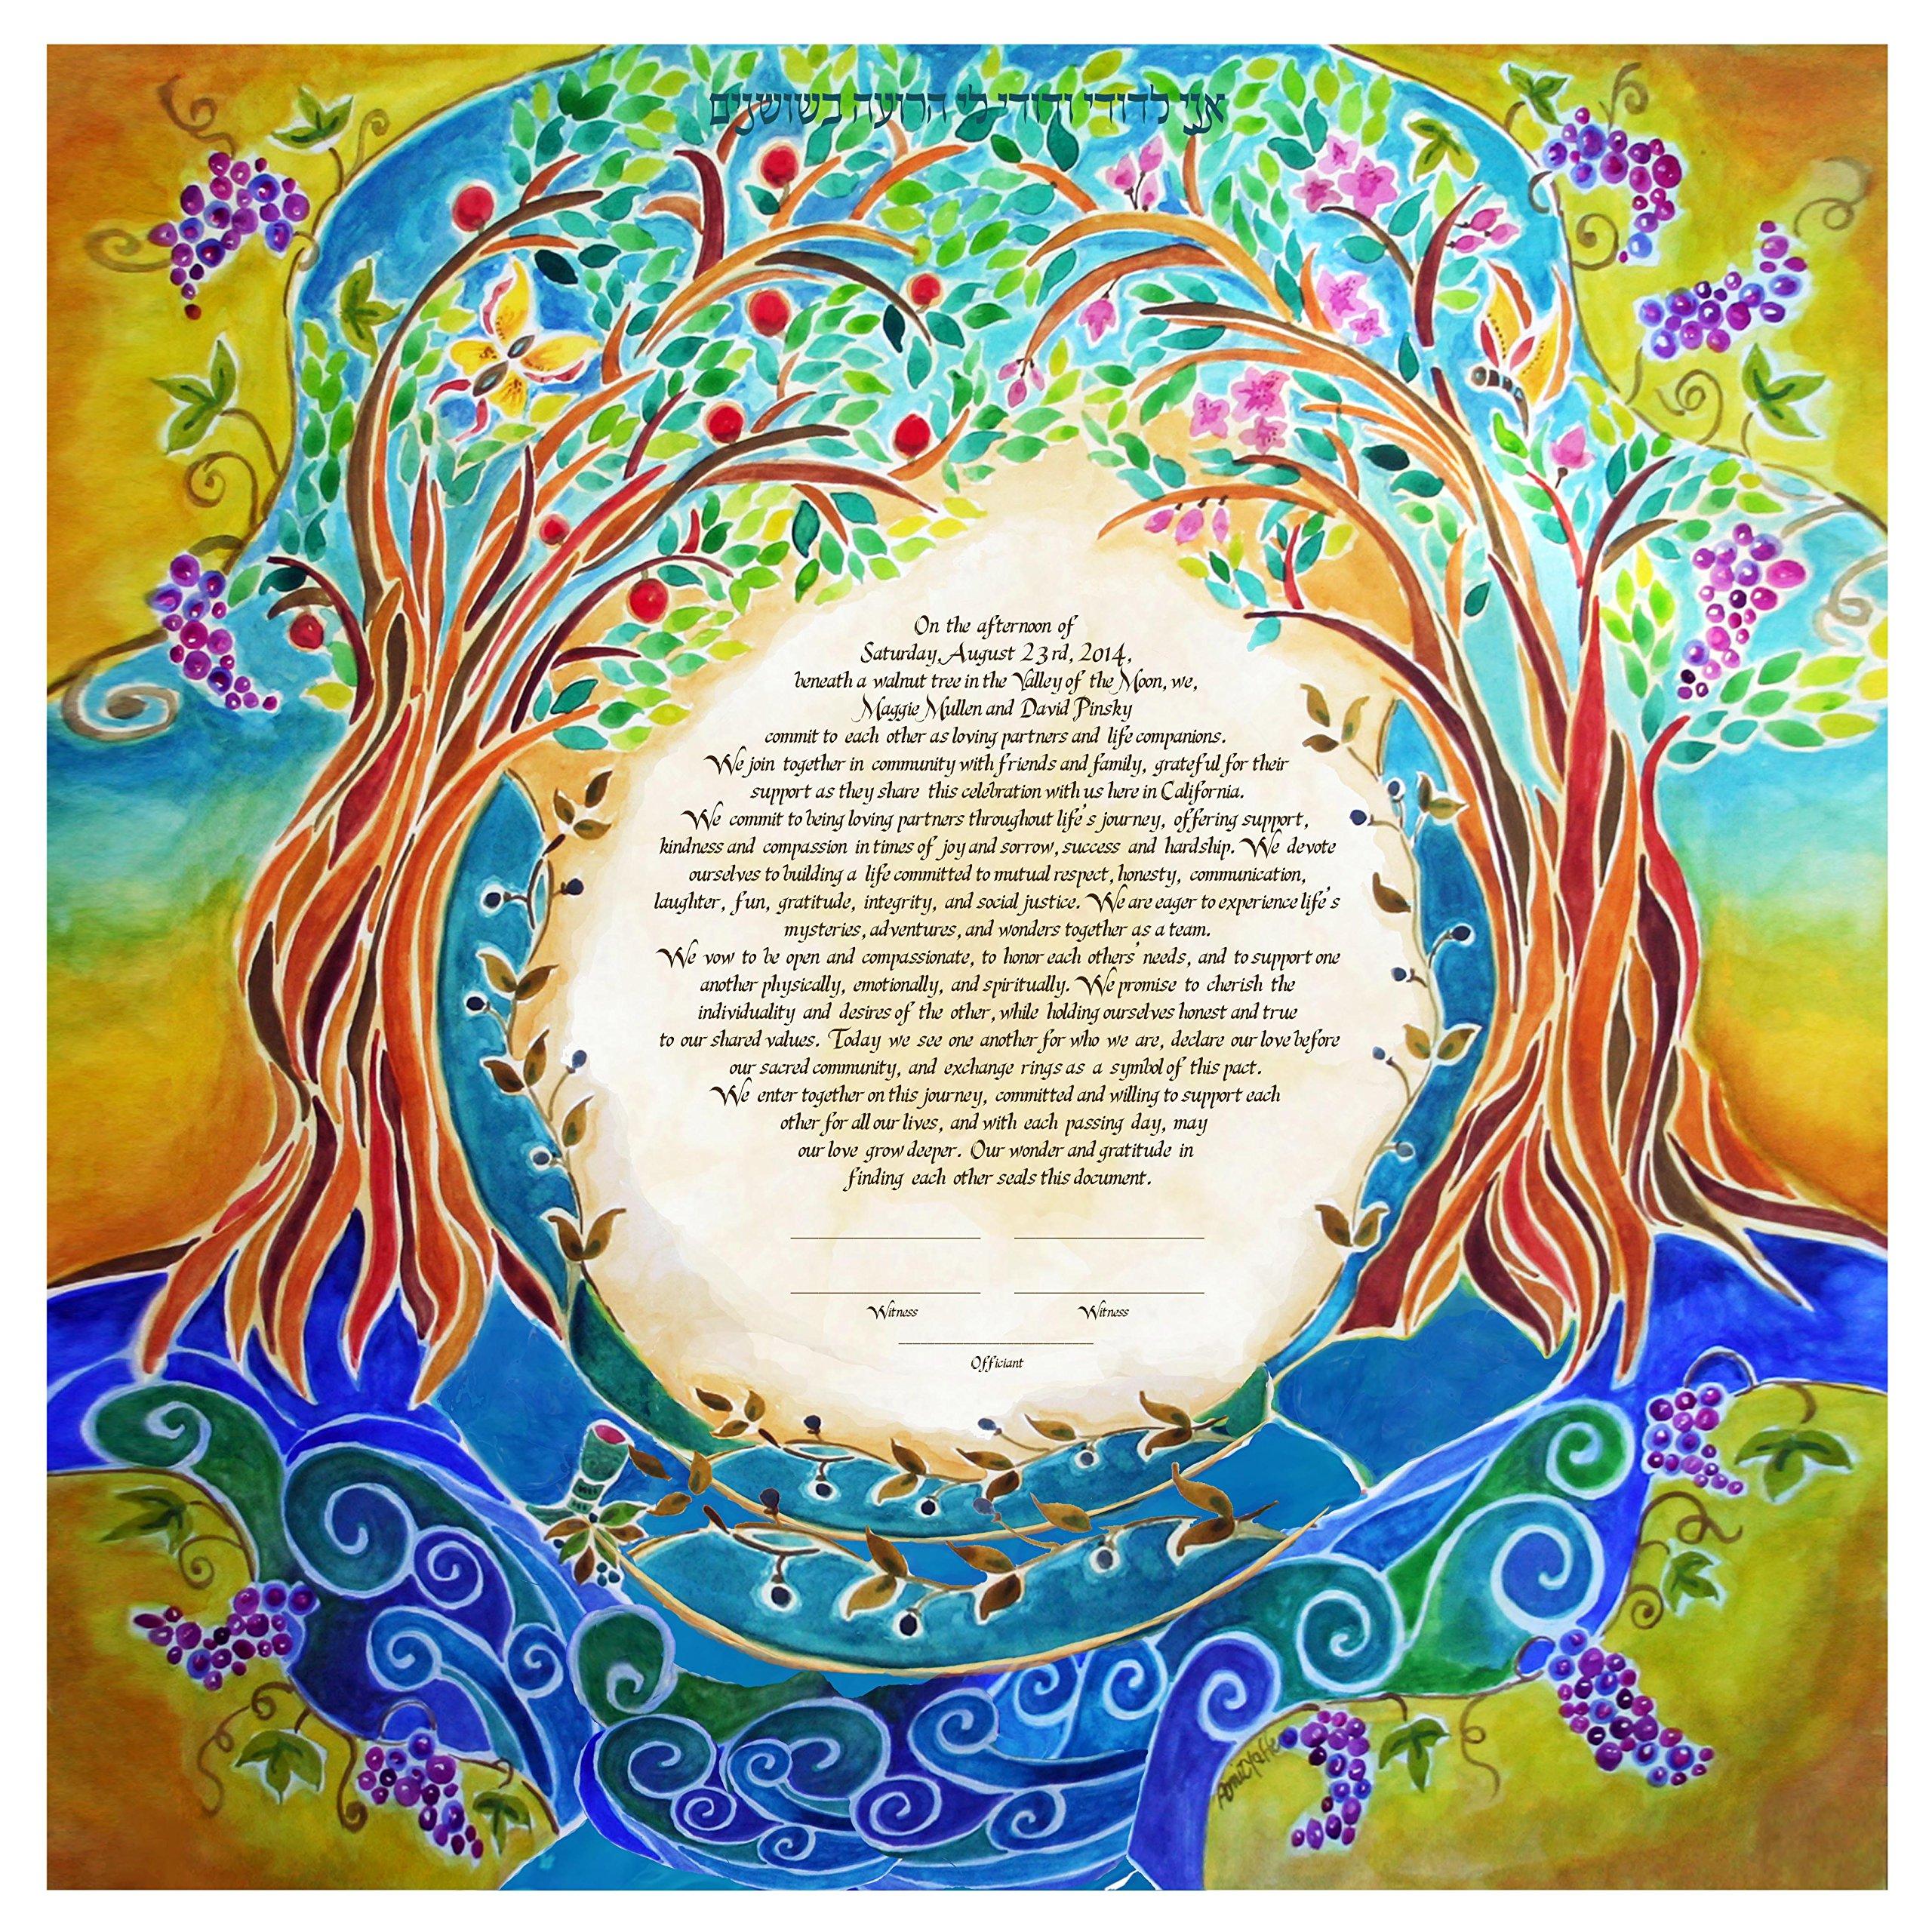 Custom Ketubah - Jewish Wedding Contract - Personalized Ketubah - Jewish Judaica Art - Hebrew English - Blessings